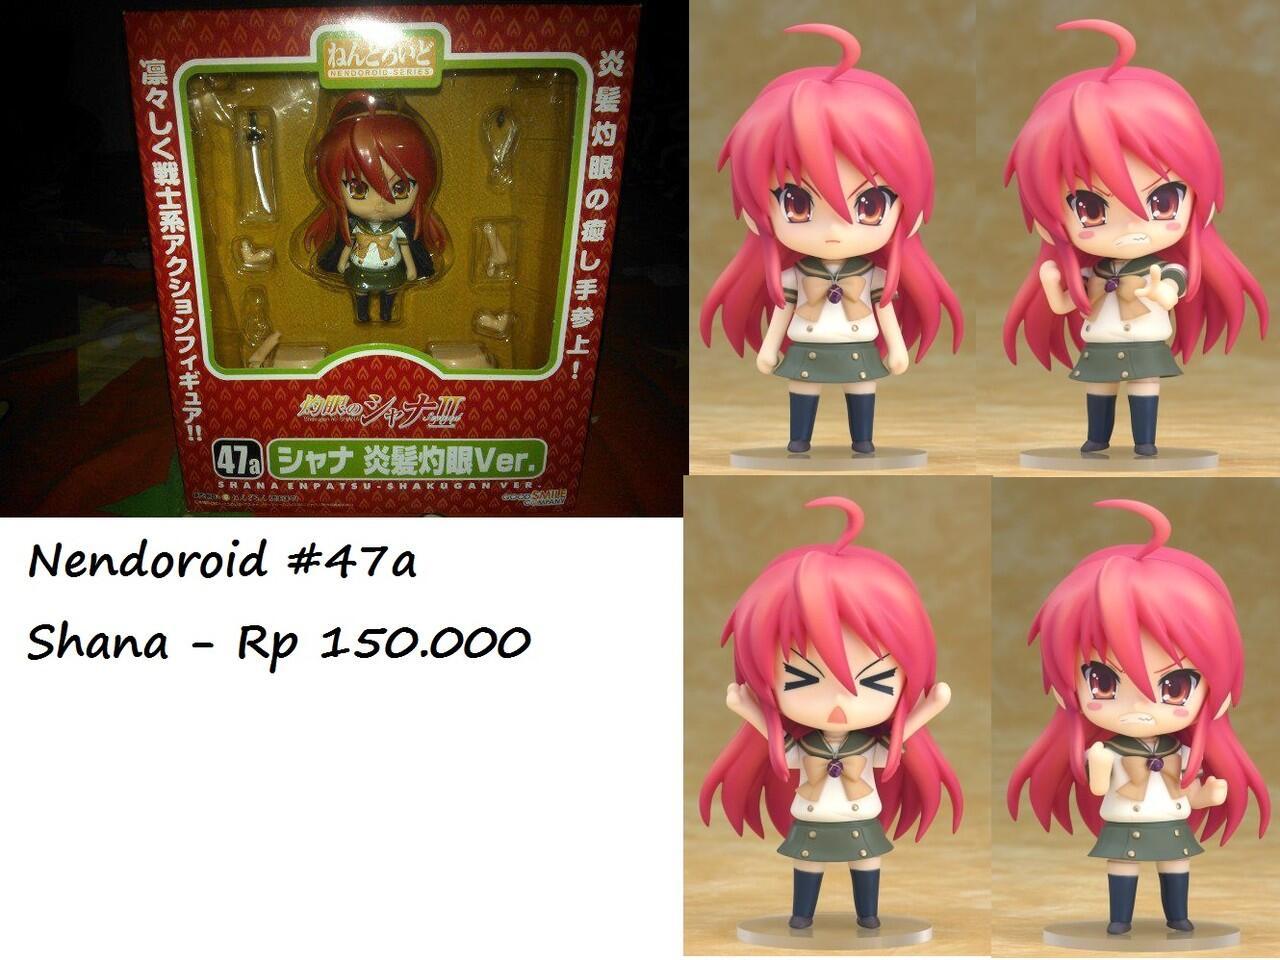 Joe's Hobby Shop : Jual Nendoroid Kualitas Ori~